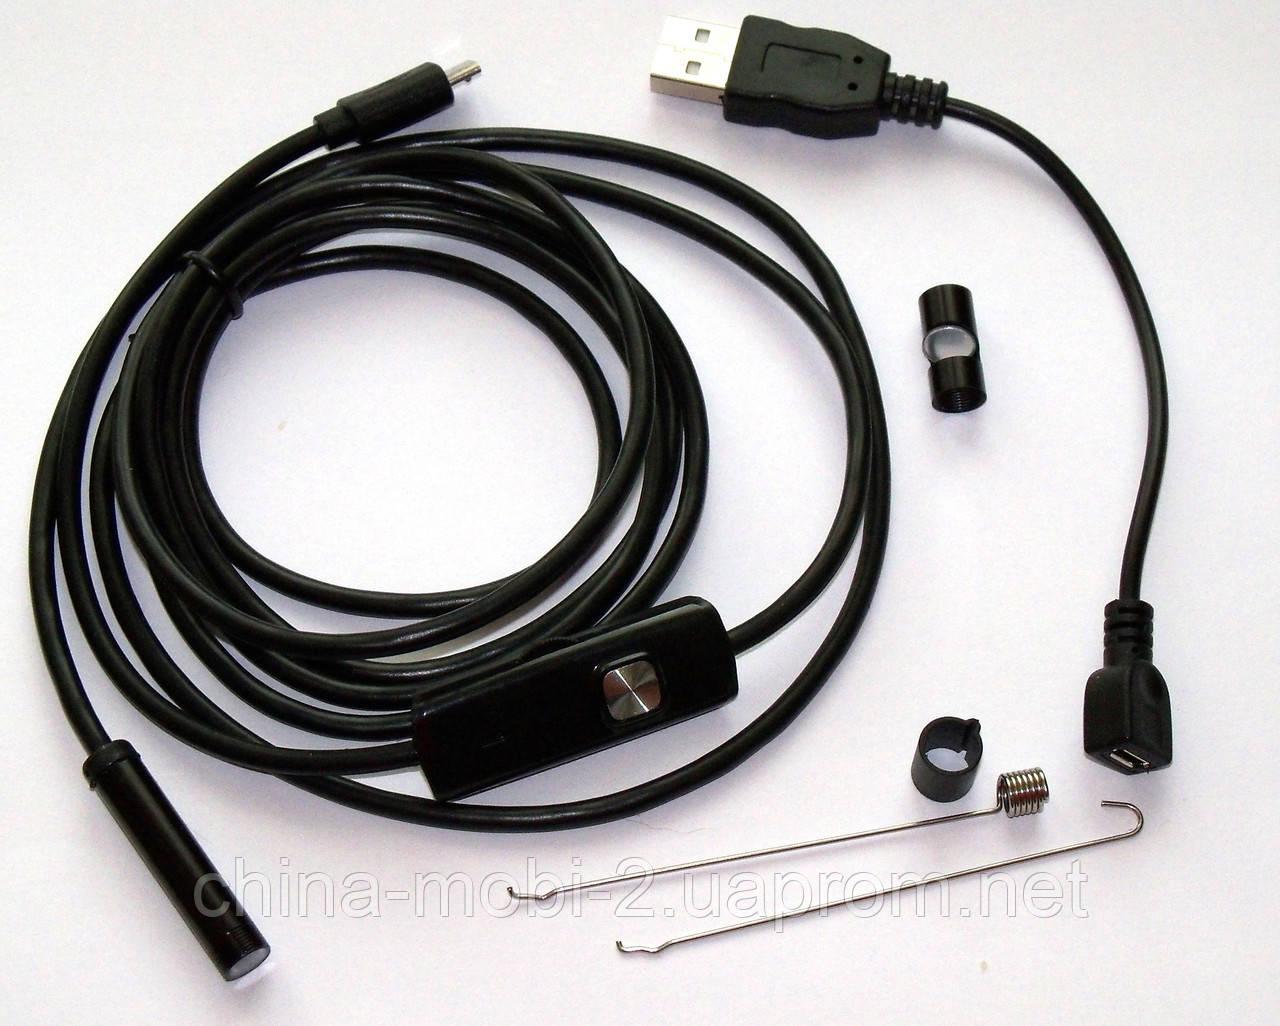 Технический эндоскоп USB - microUSB камера бороскоп водонепроницаемая 2м Endoscope Windows Android